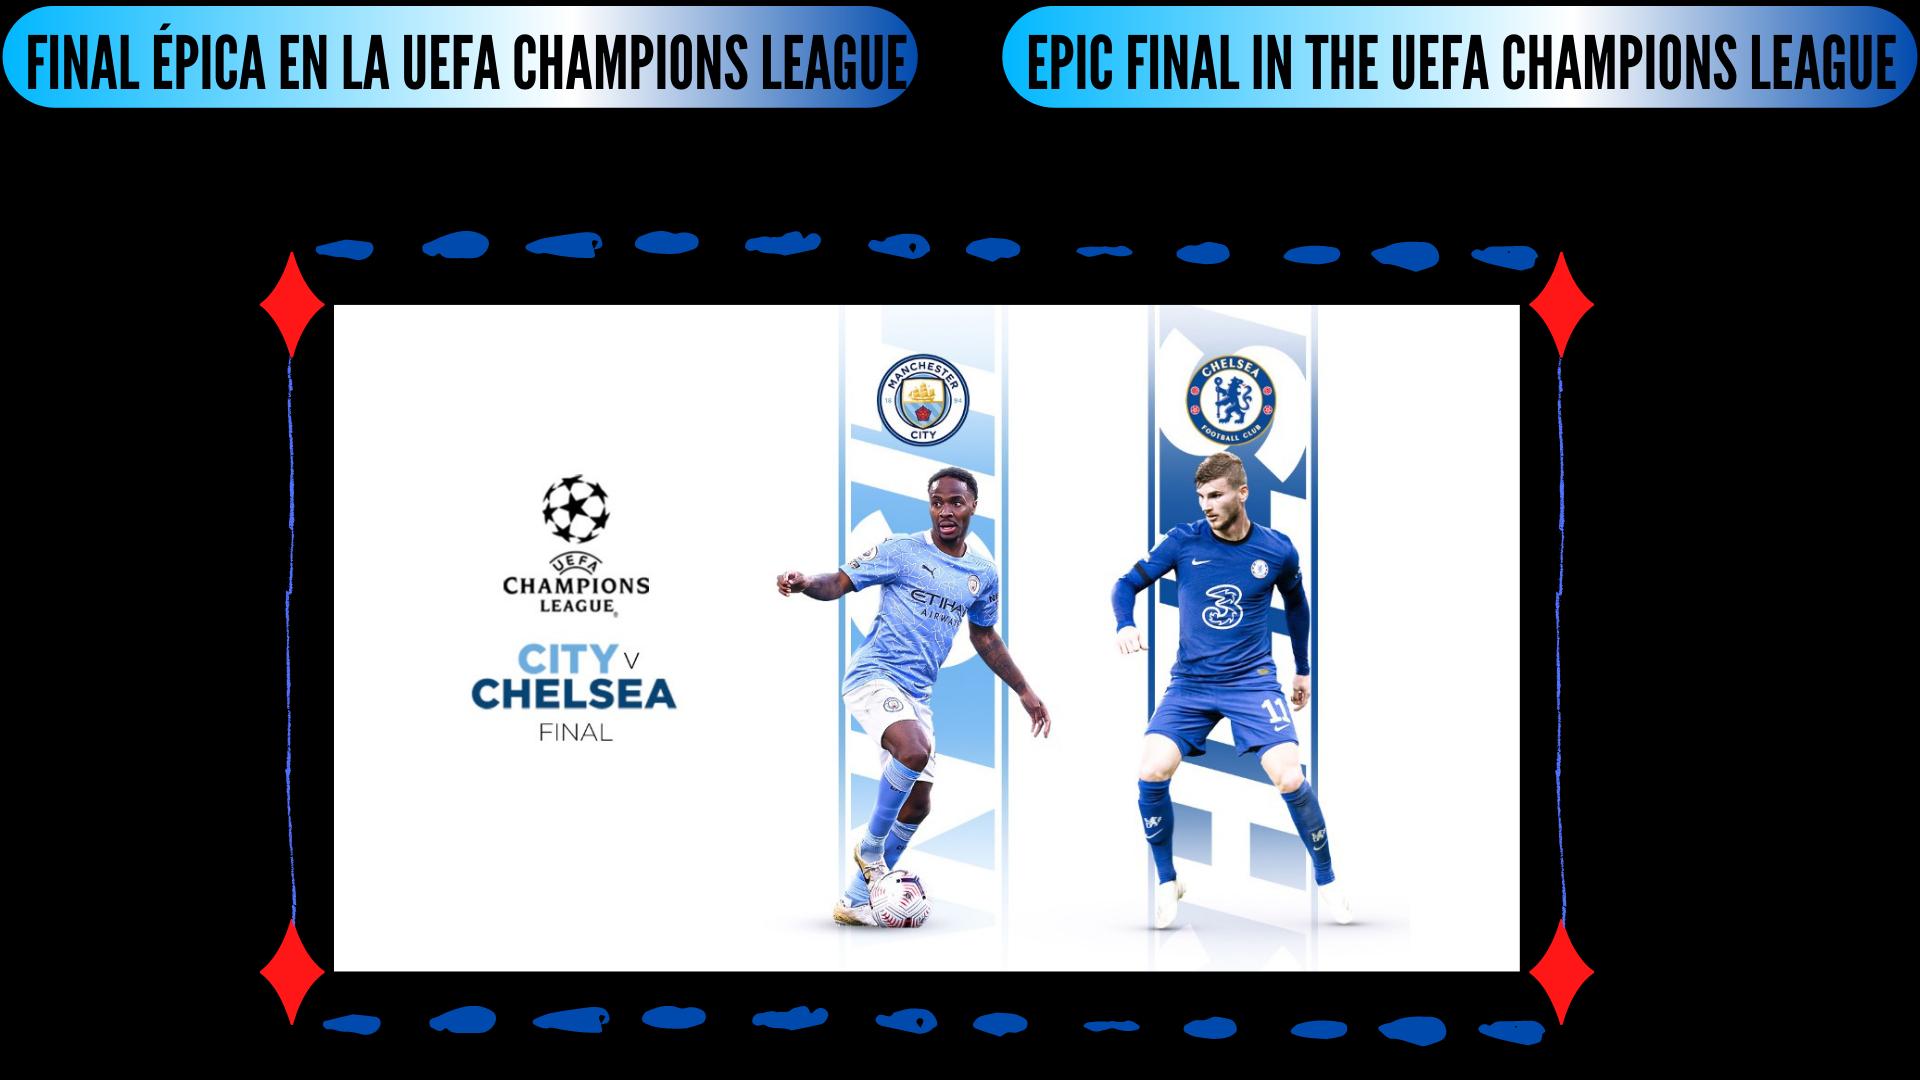 Final de la UEFA Champions League.png